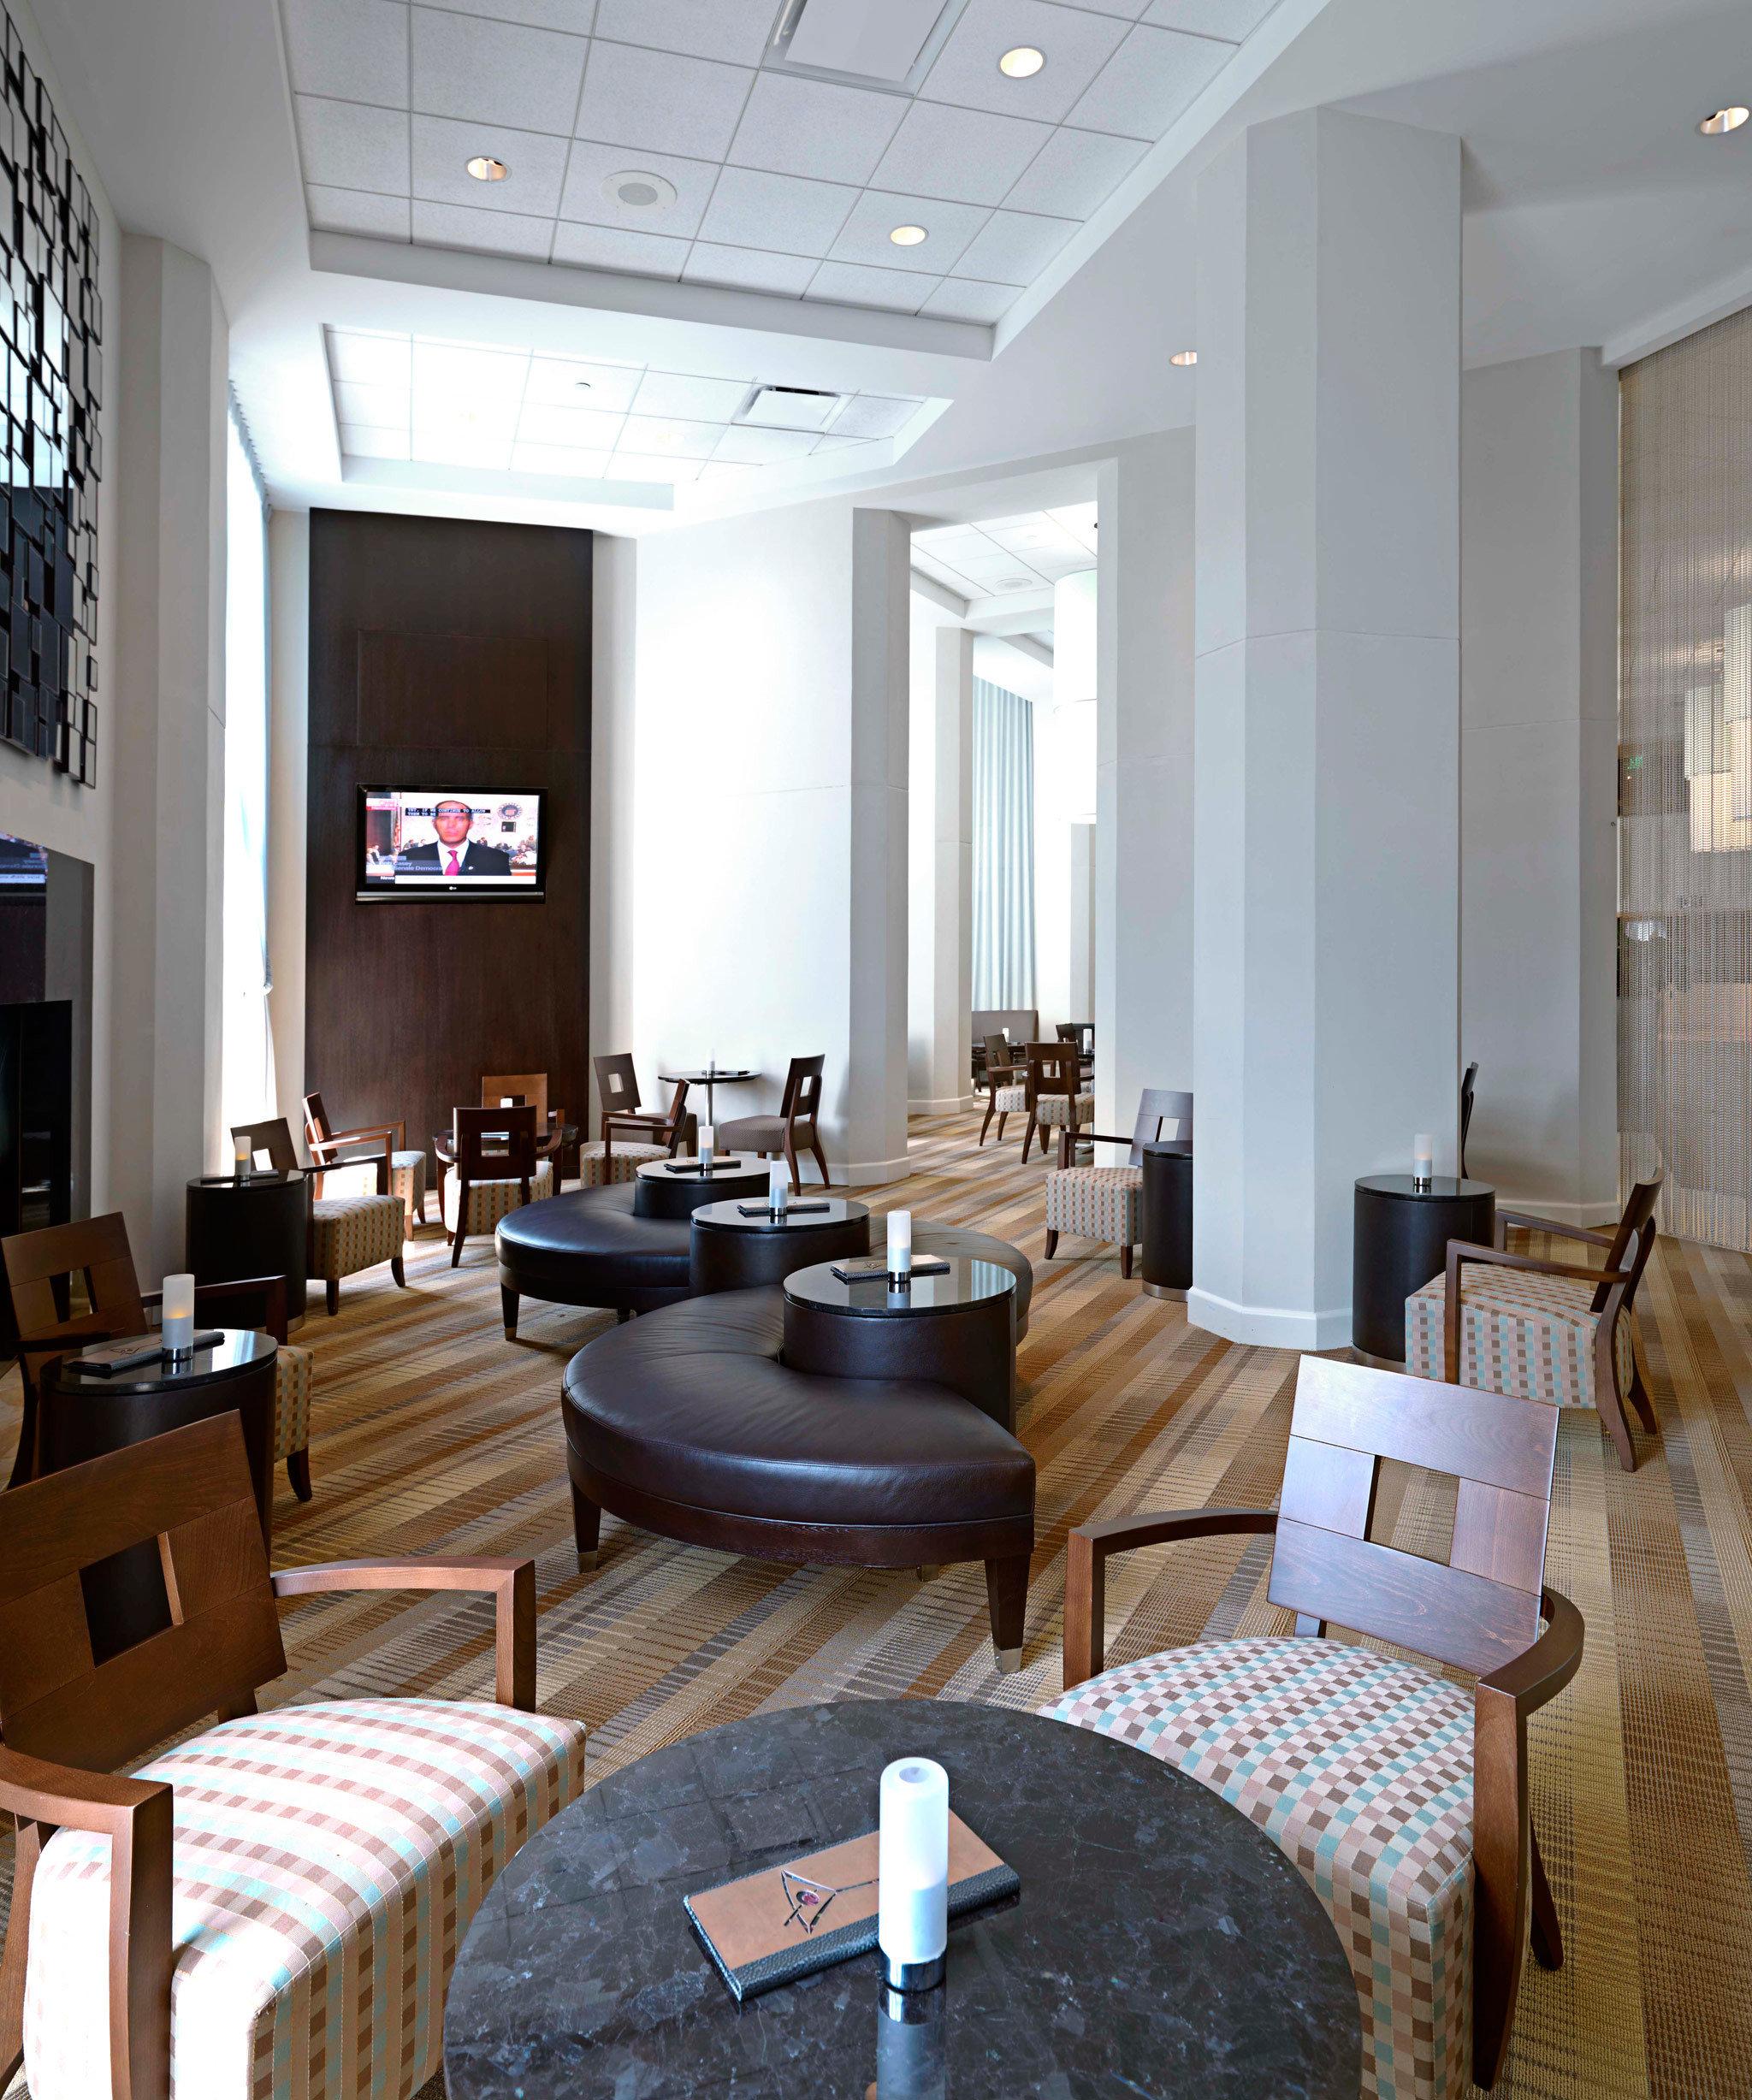 Lounge Luxury property Lobby living room home condominium Suite